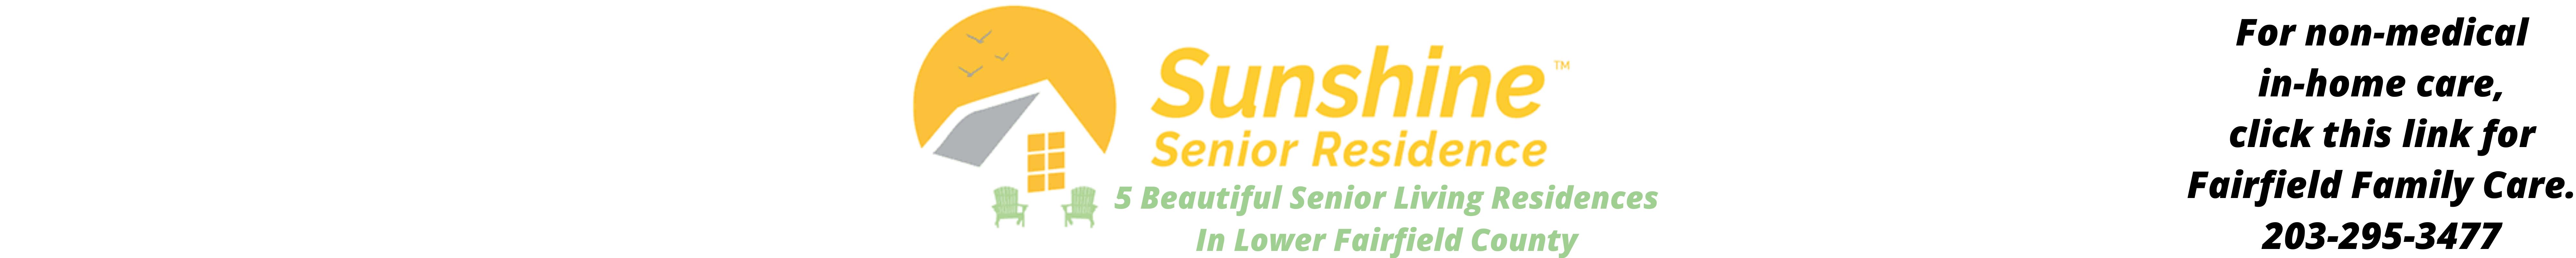 Sunshine Senior Residences | Stamford, CT | Home